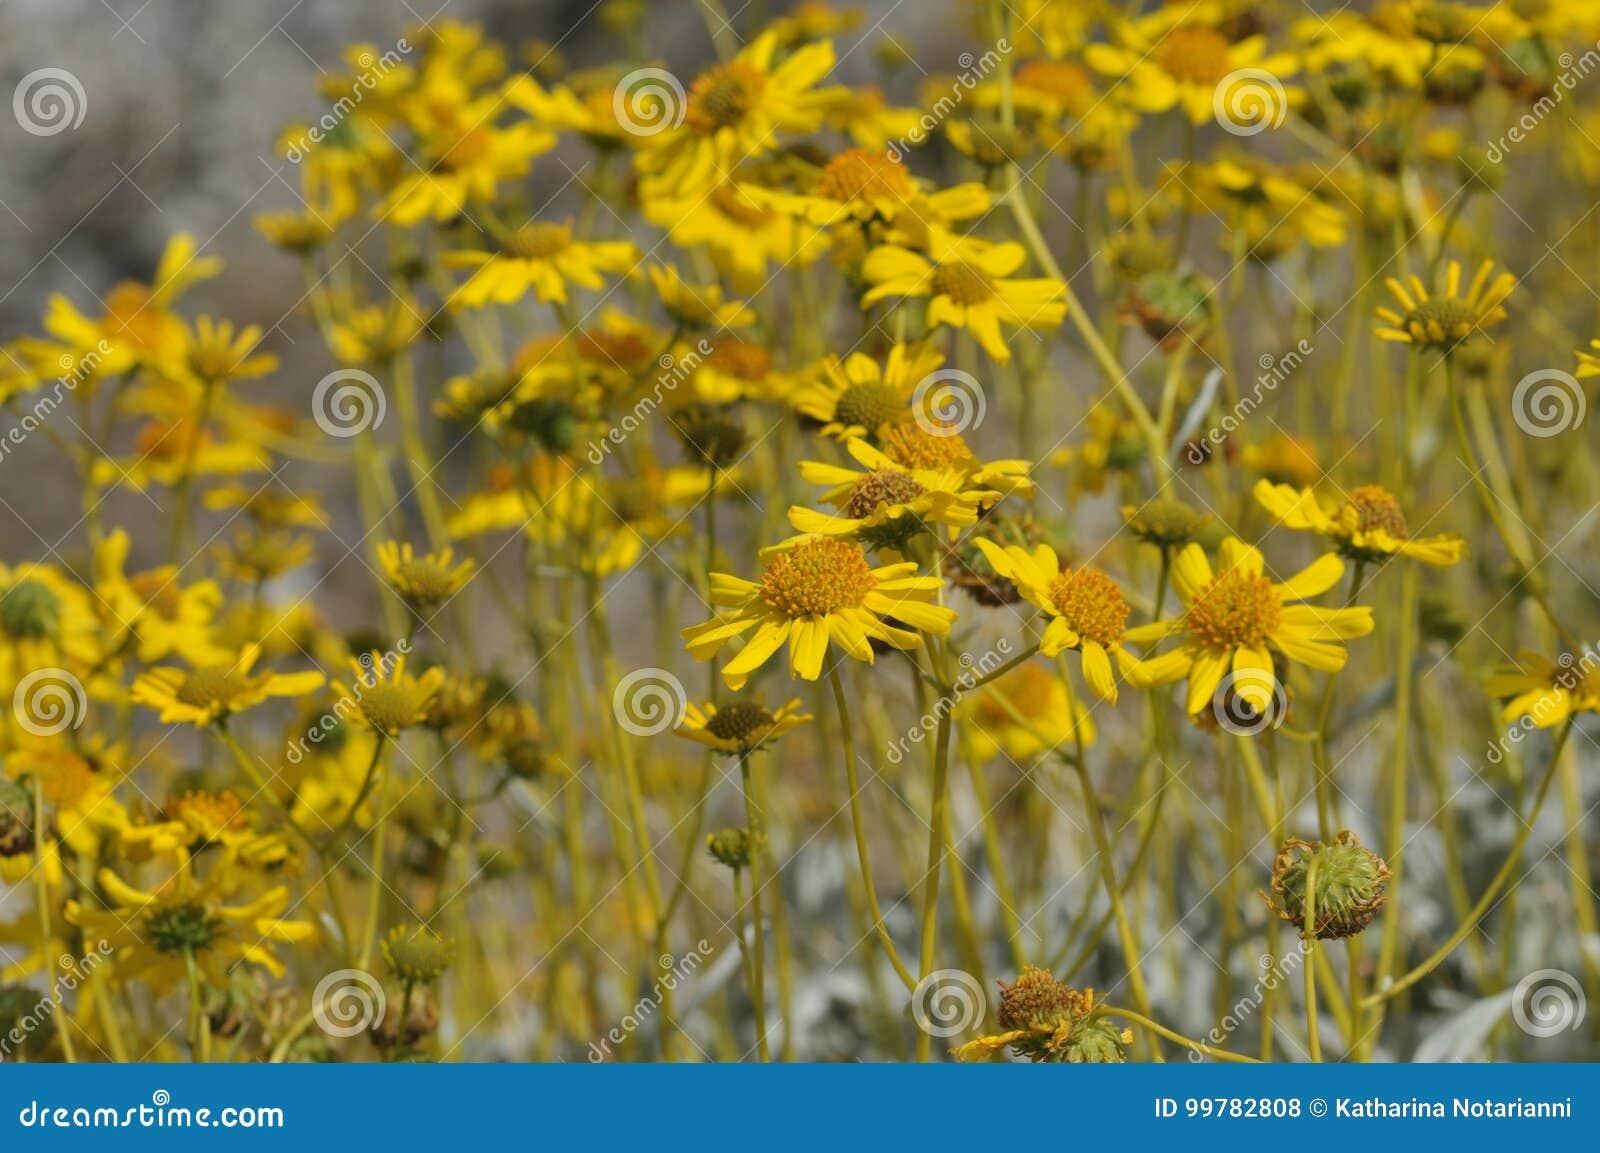 Field of Yellow Wildflowers in Full Bloom on Desert Floor